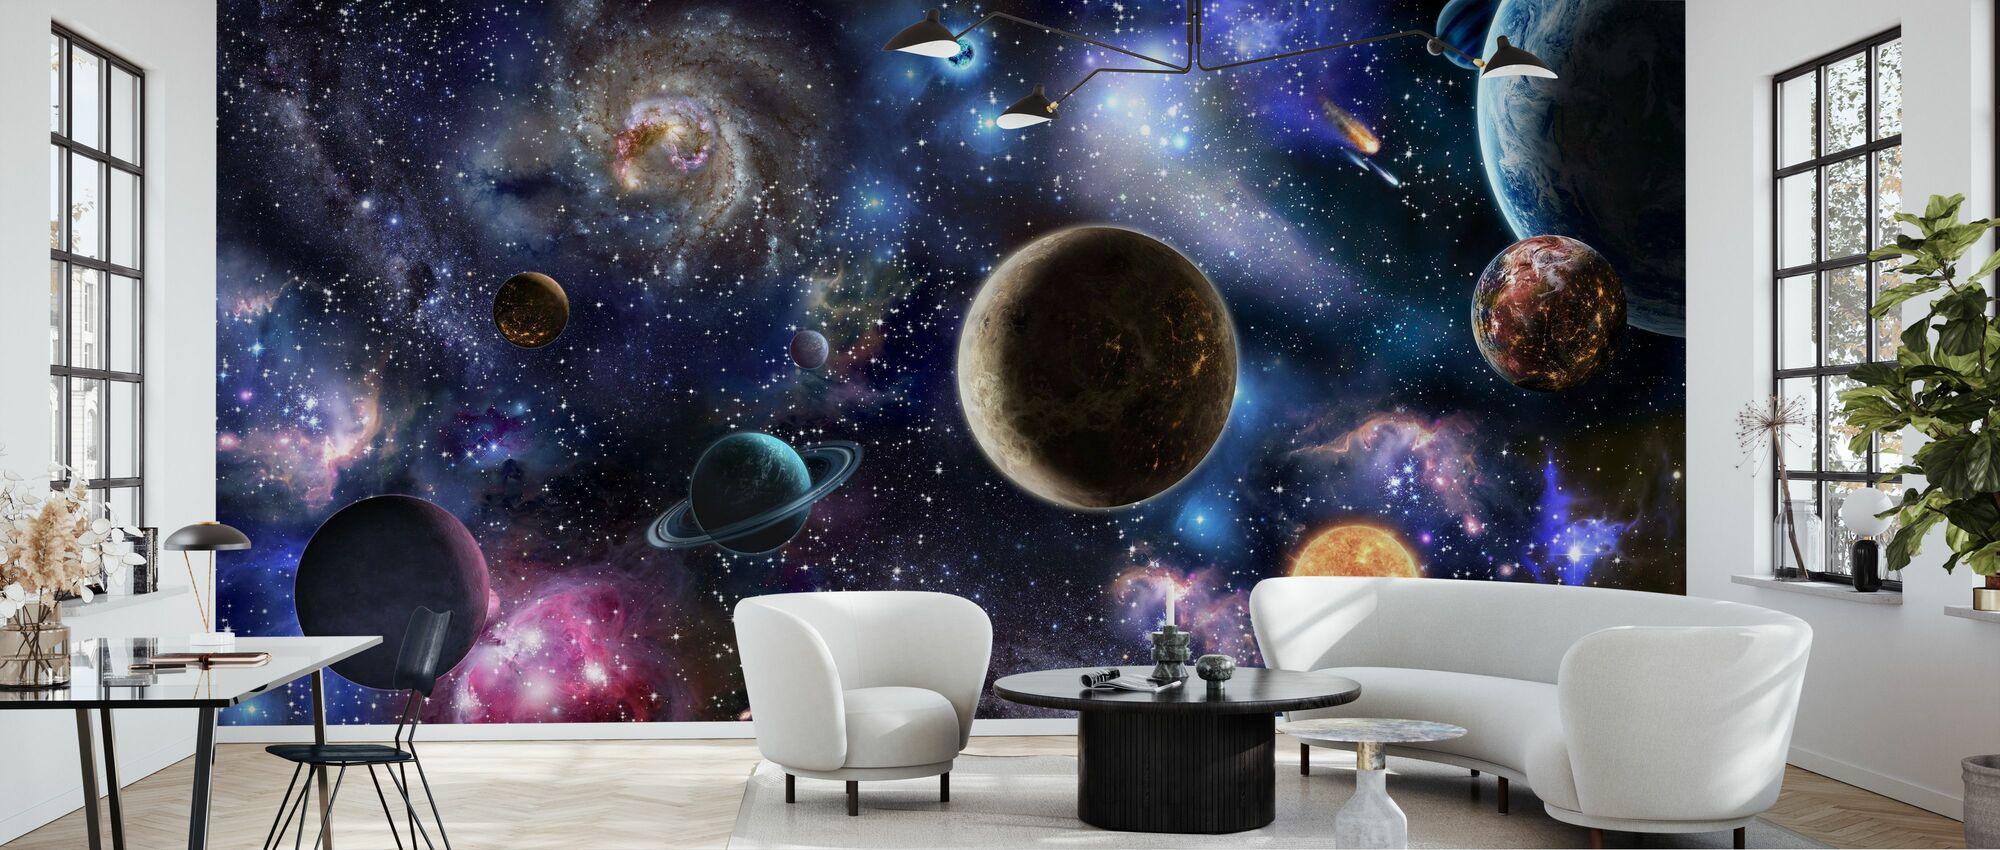 Geweldige ruimte - Behang - Woonkamer